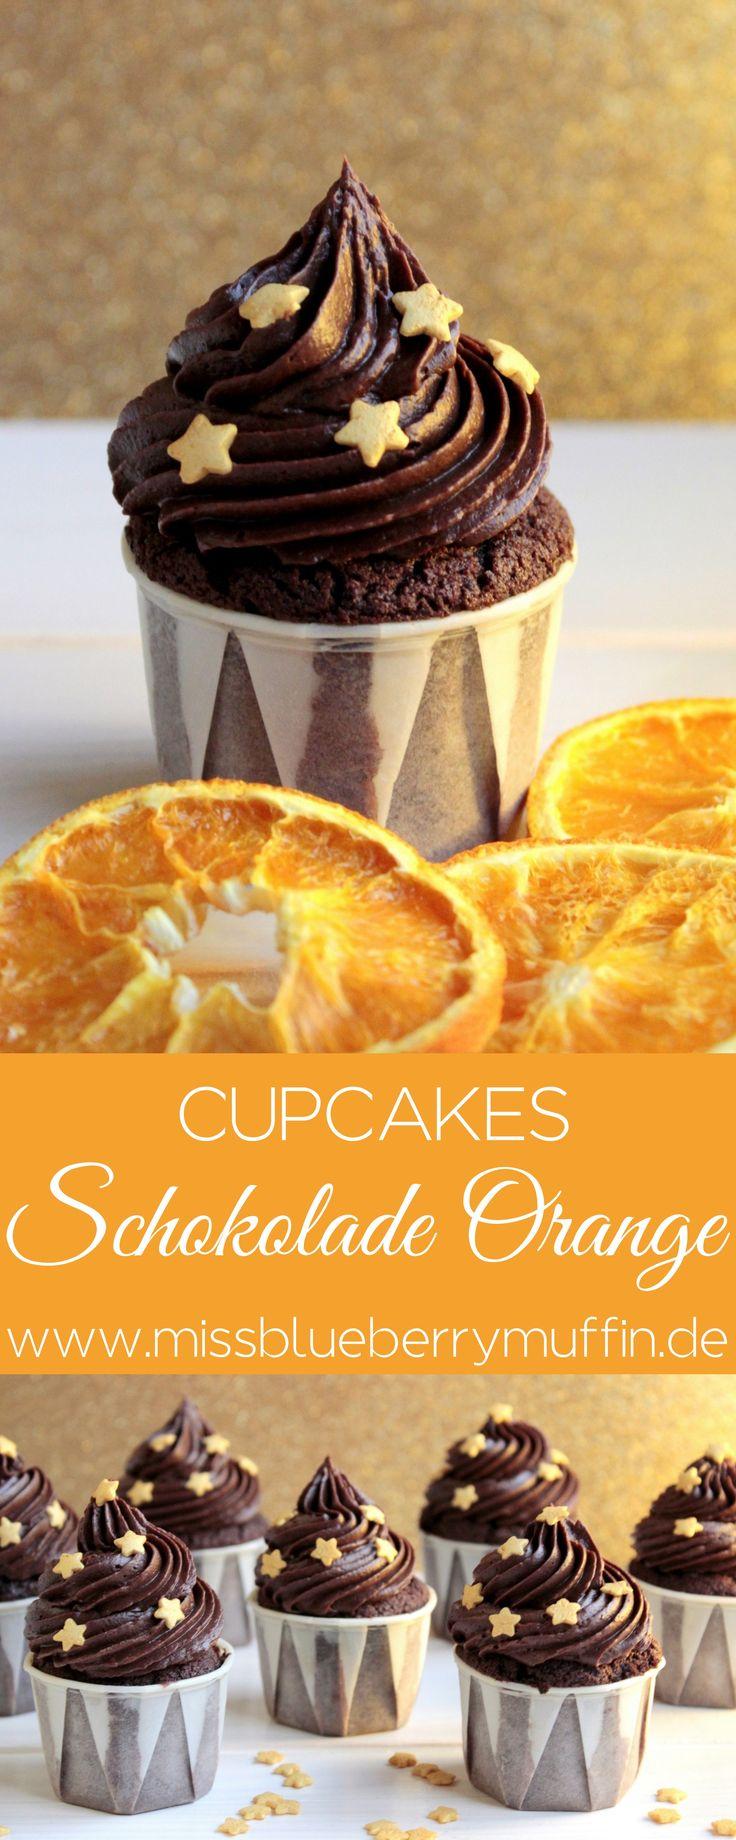 Schokoladen-Orangen-Cupcakes // Chocolate Orange Cupcakes // Ganache <3